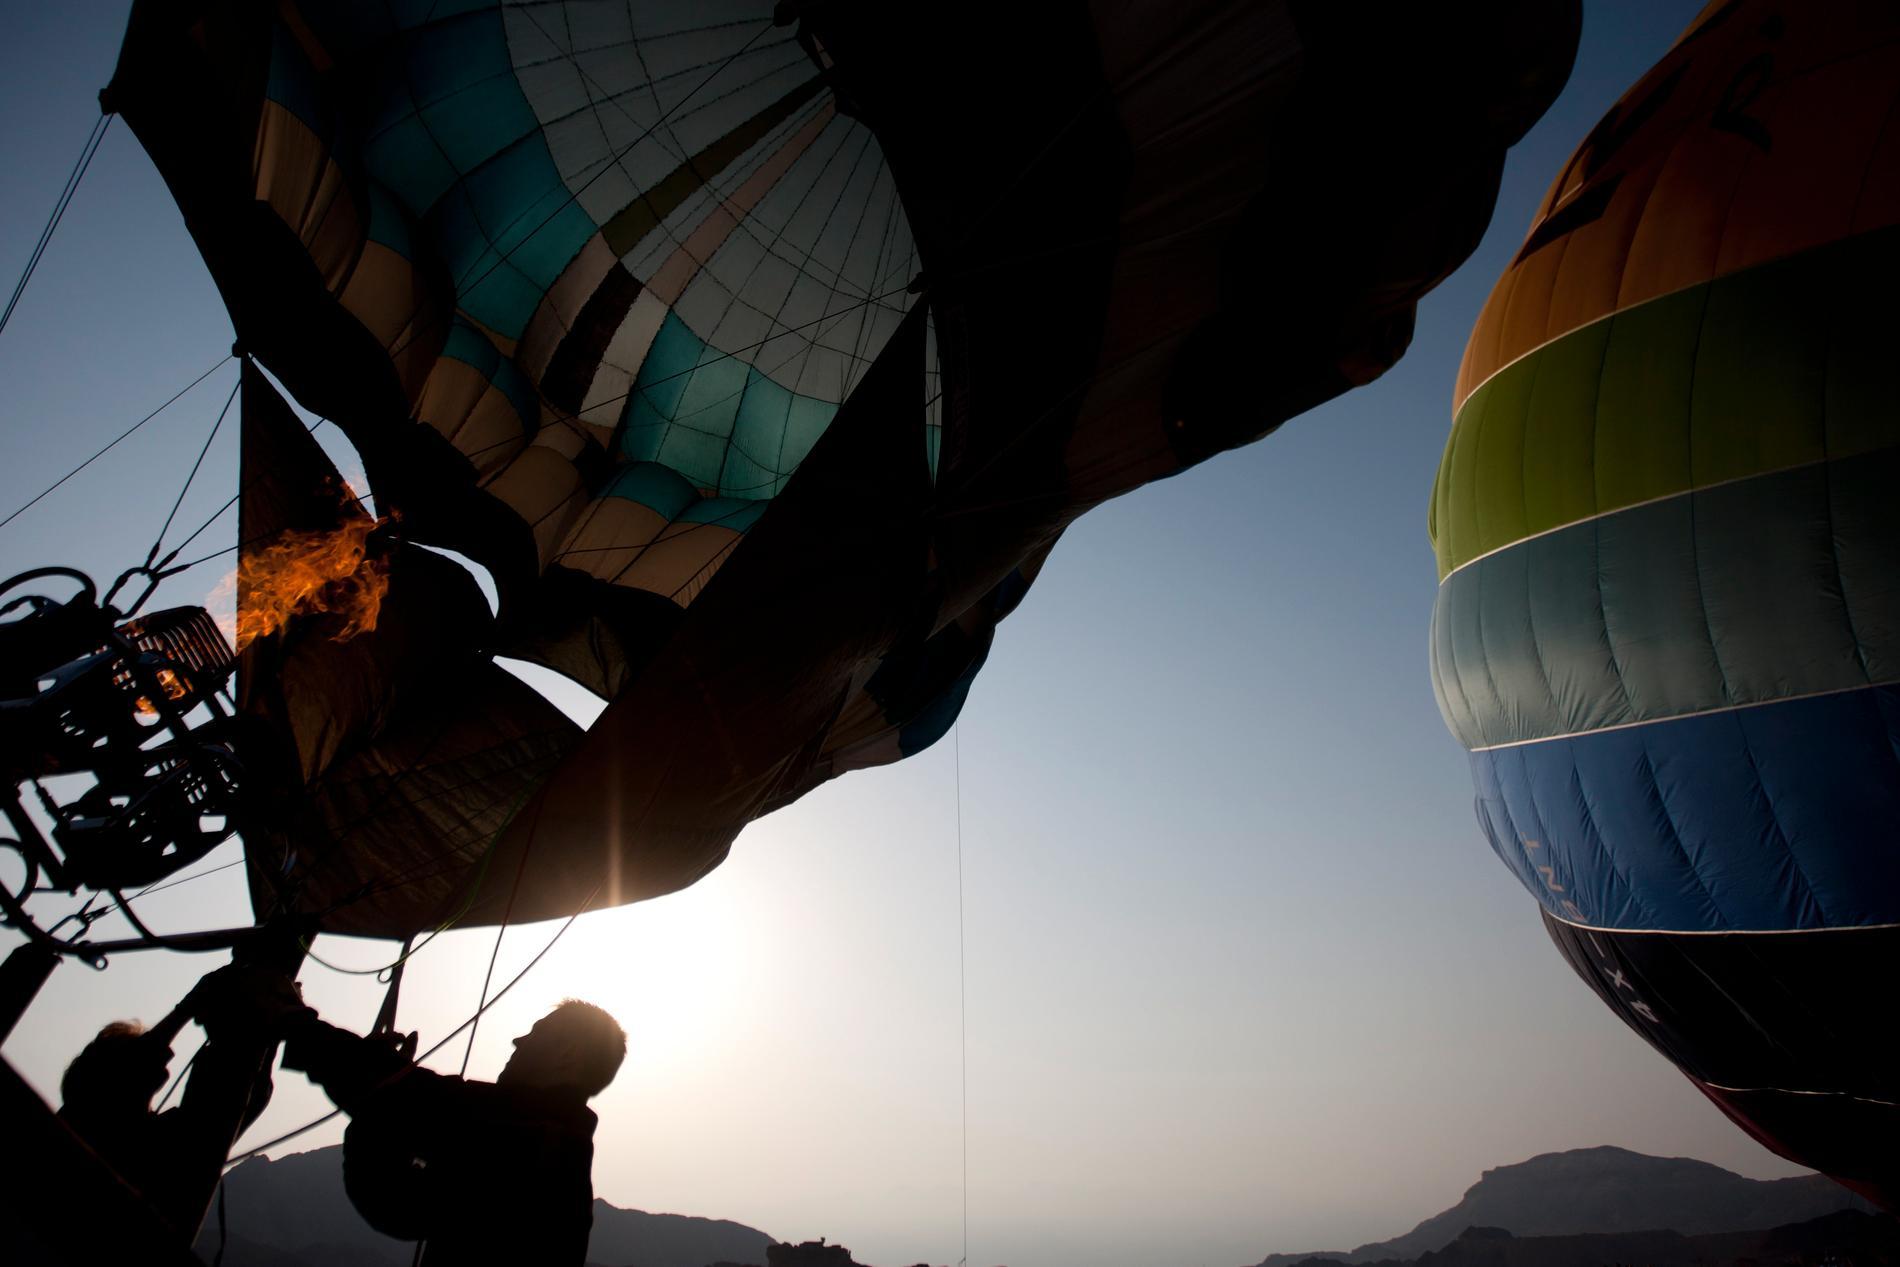 En luftballong har gått ner i ett bostadsområde under tisdagskvällen. Arkivbild.